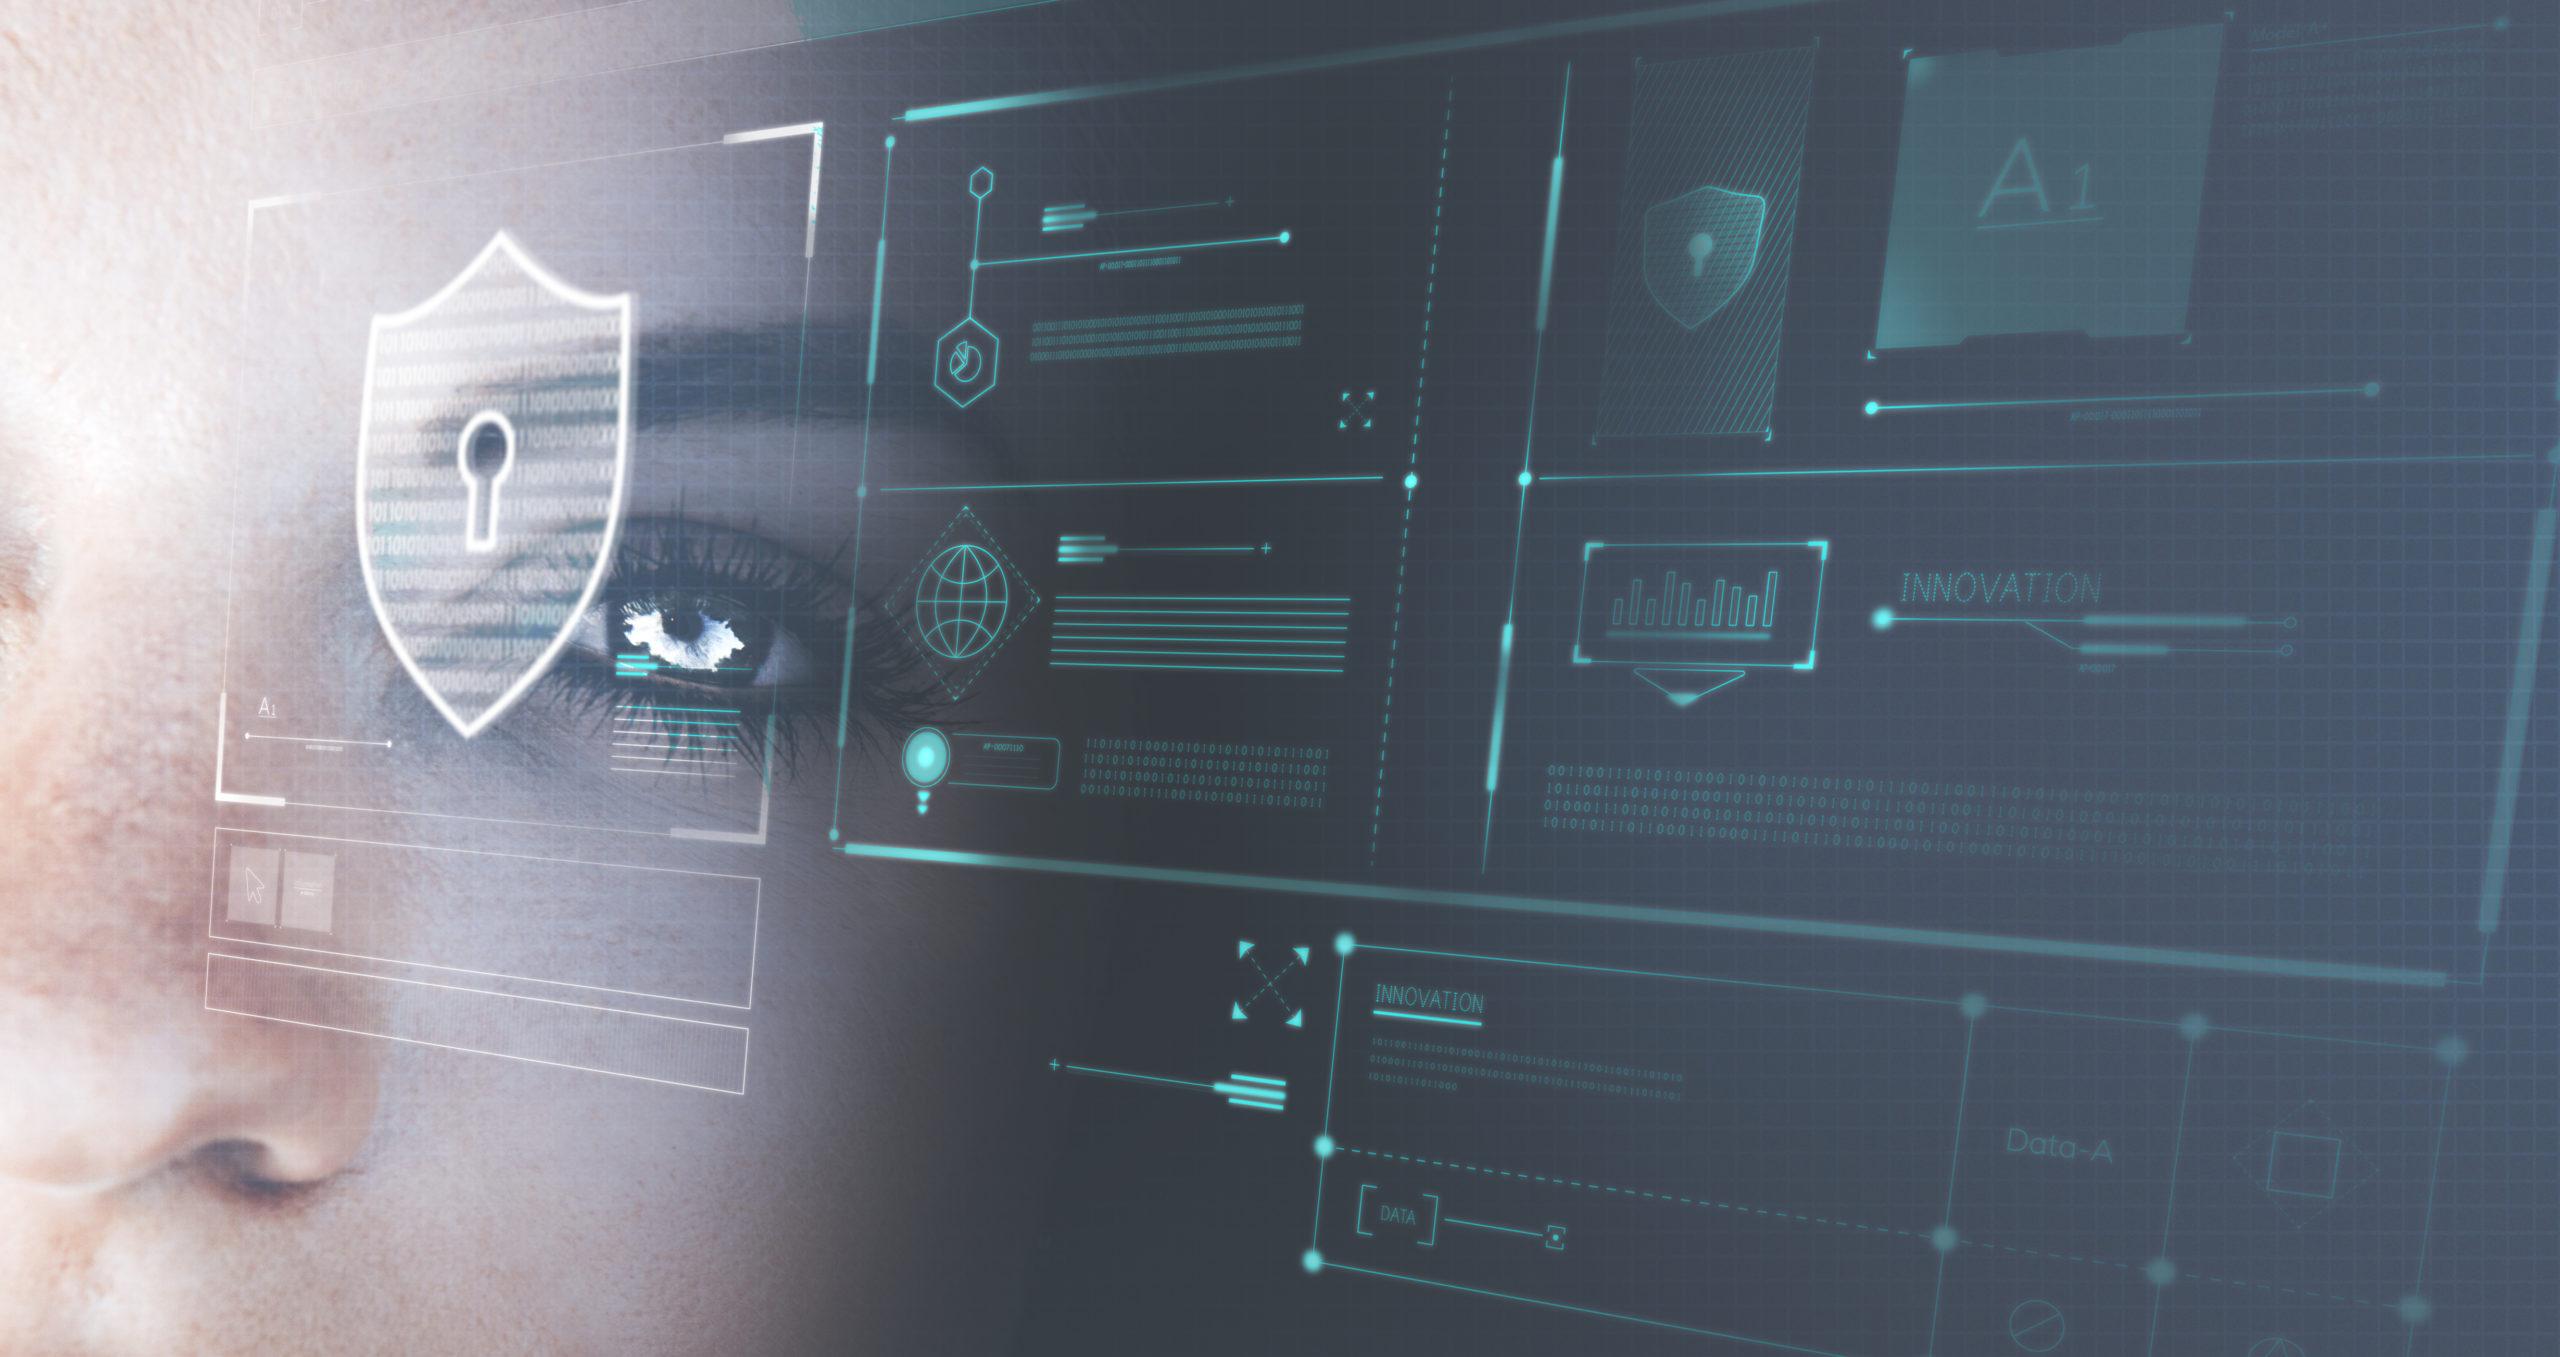 Futuristic eye close up cybersecurity